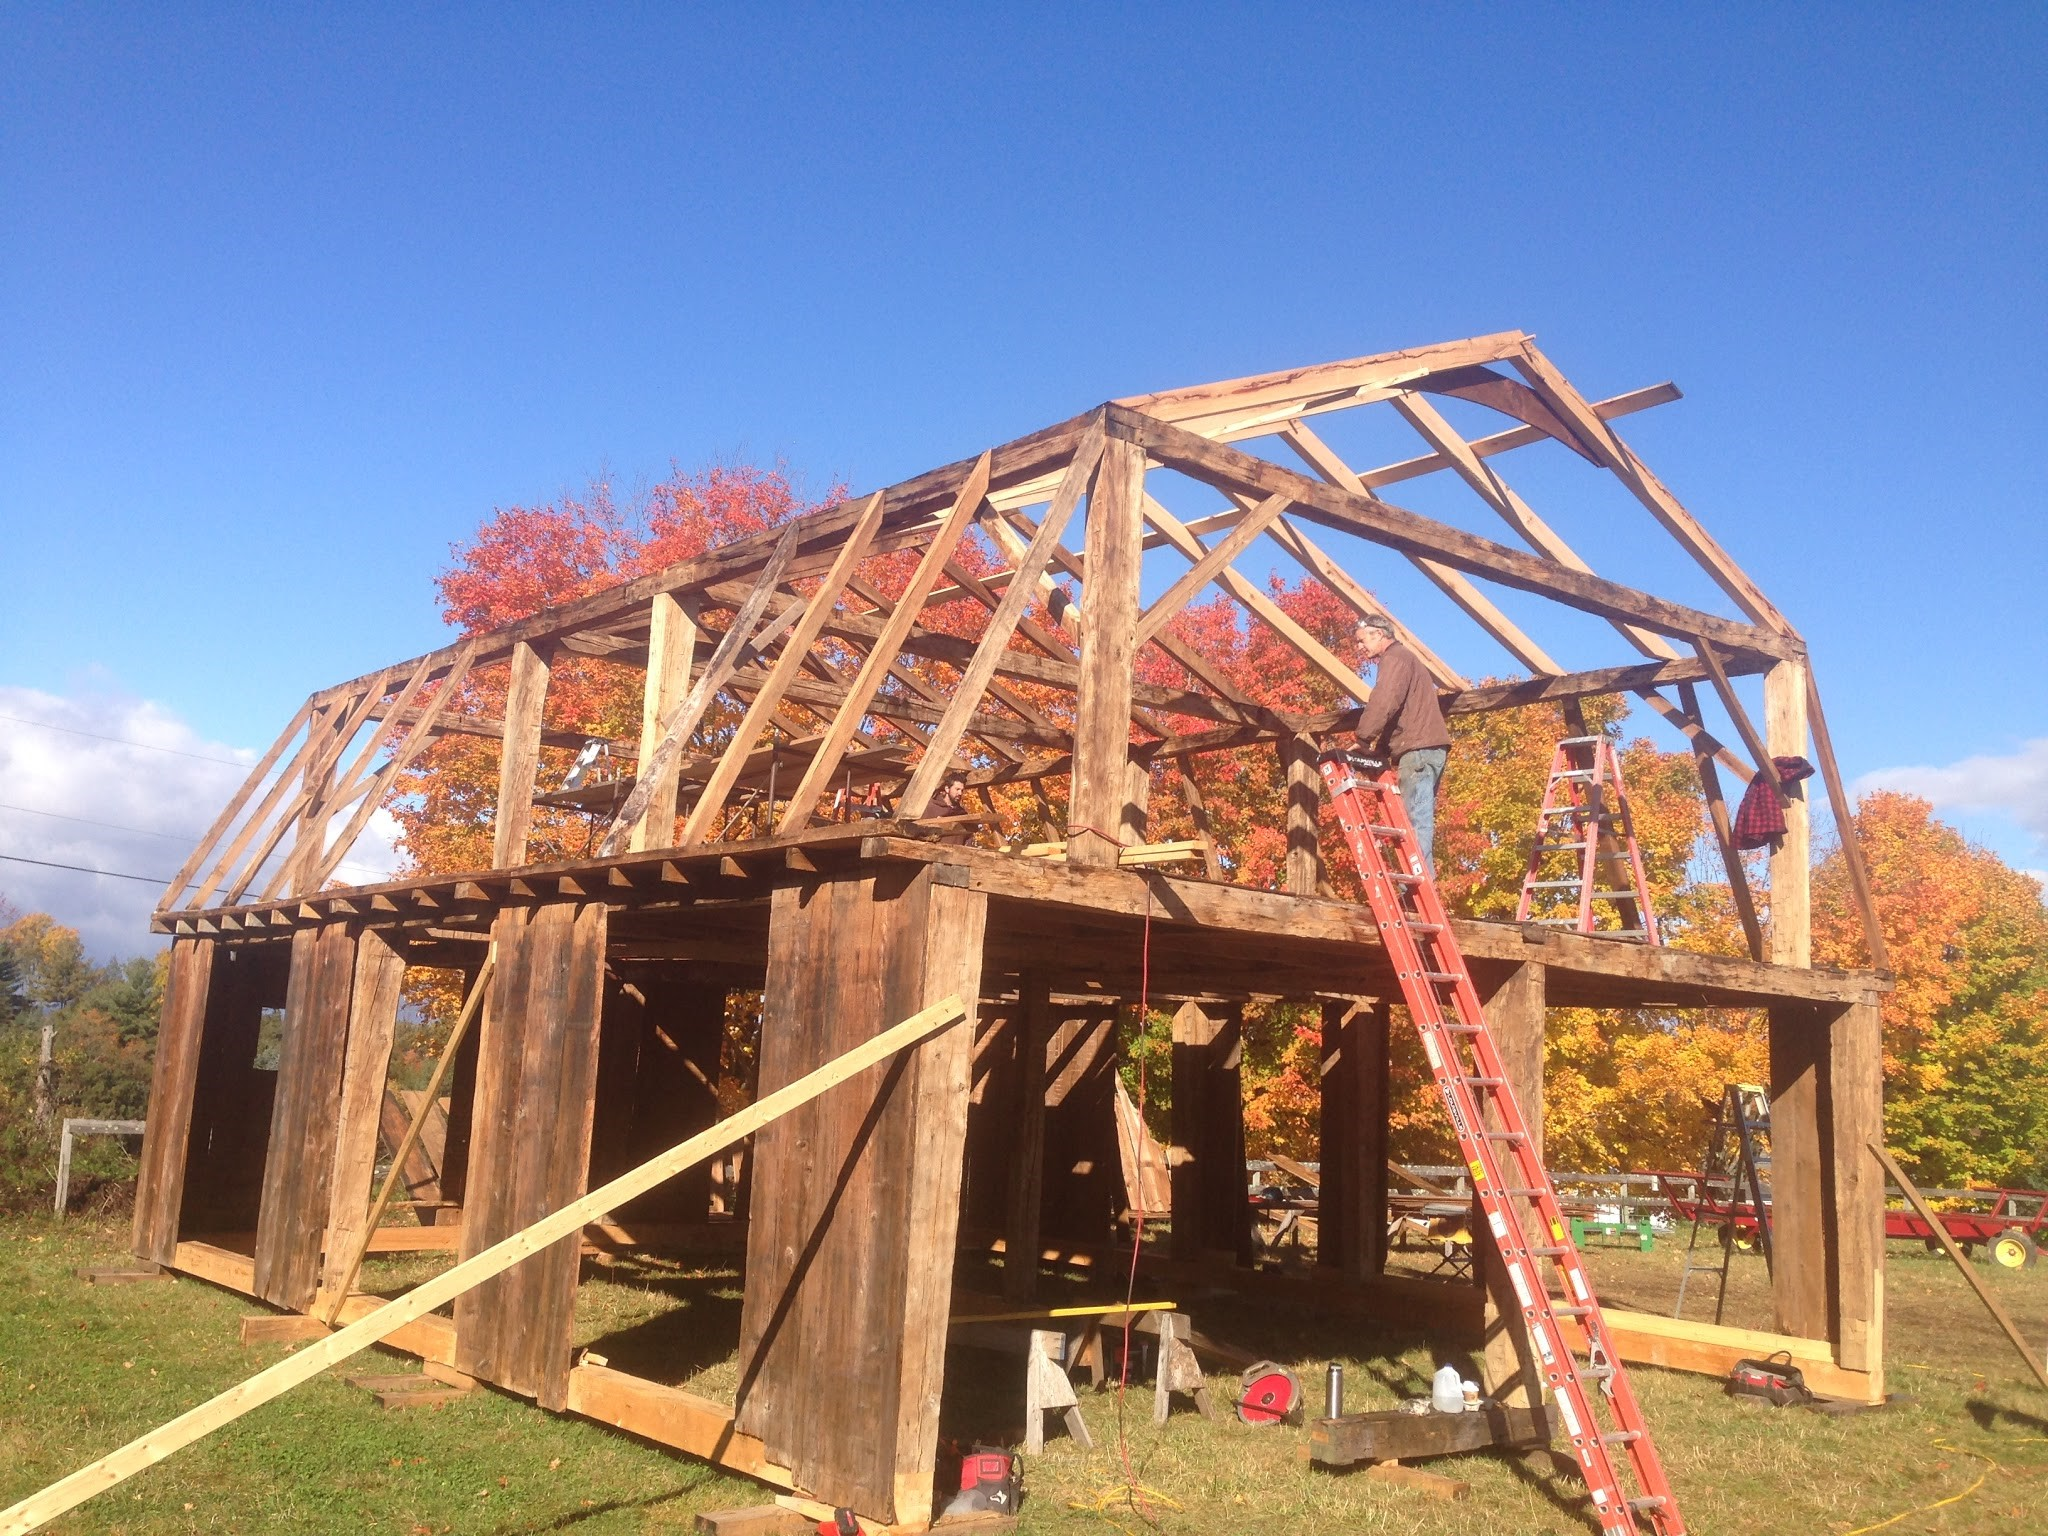 larson farm | Green Mountain Timber Frames Middletown Springs,Vermont